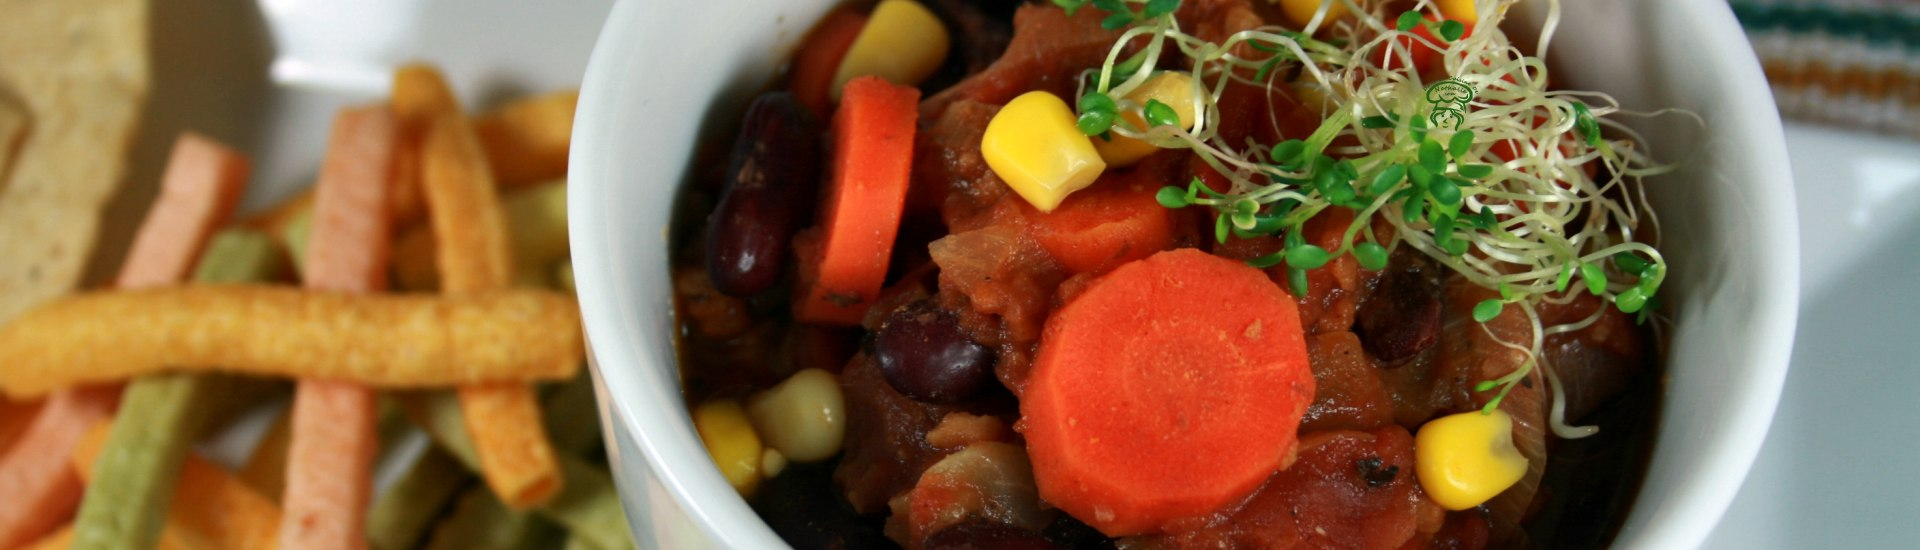 Chili sin carne express